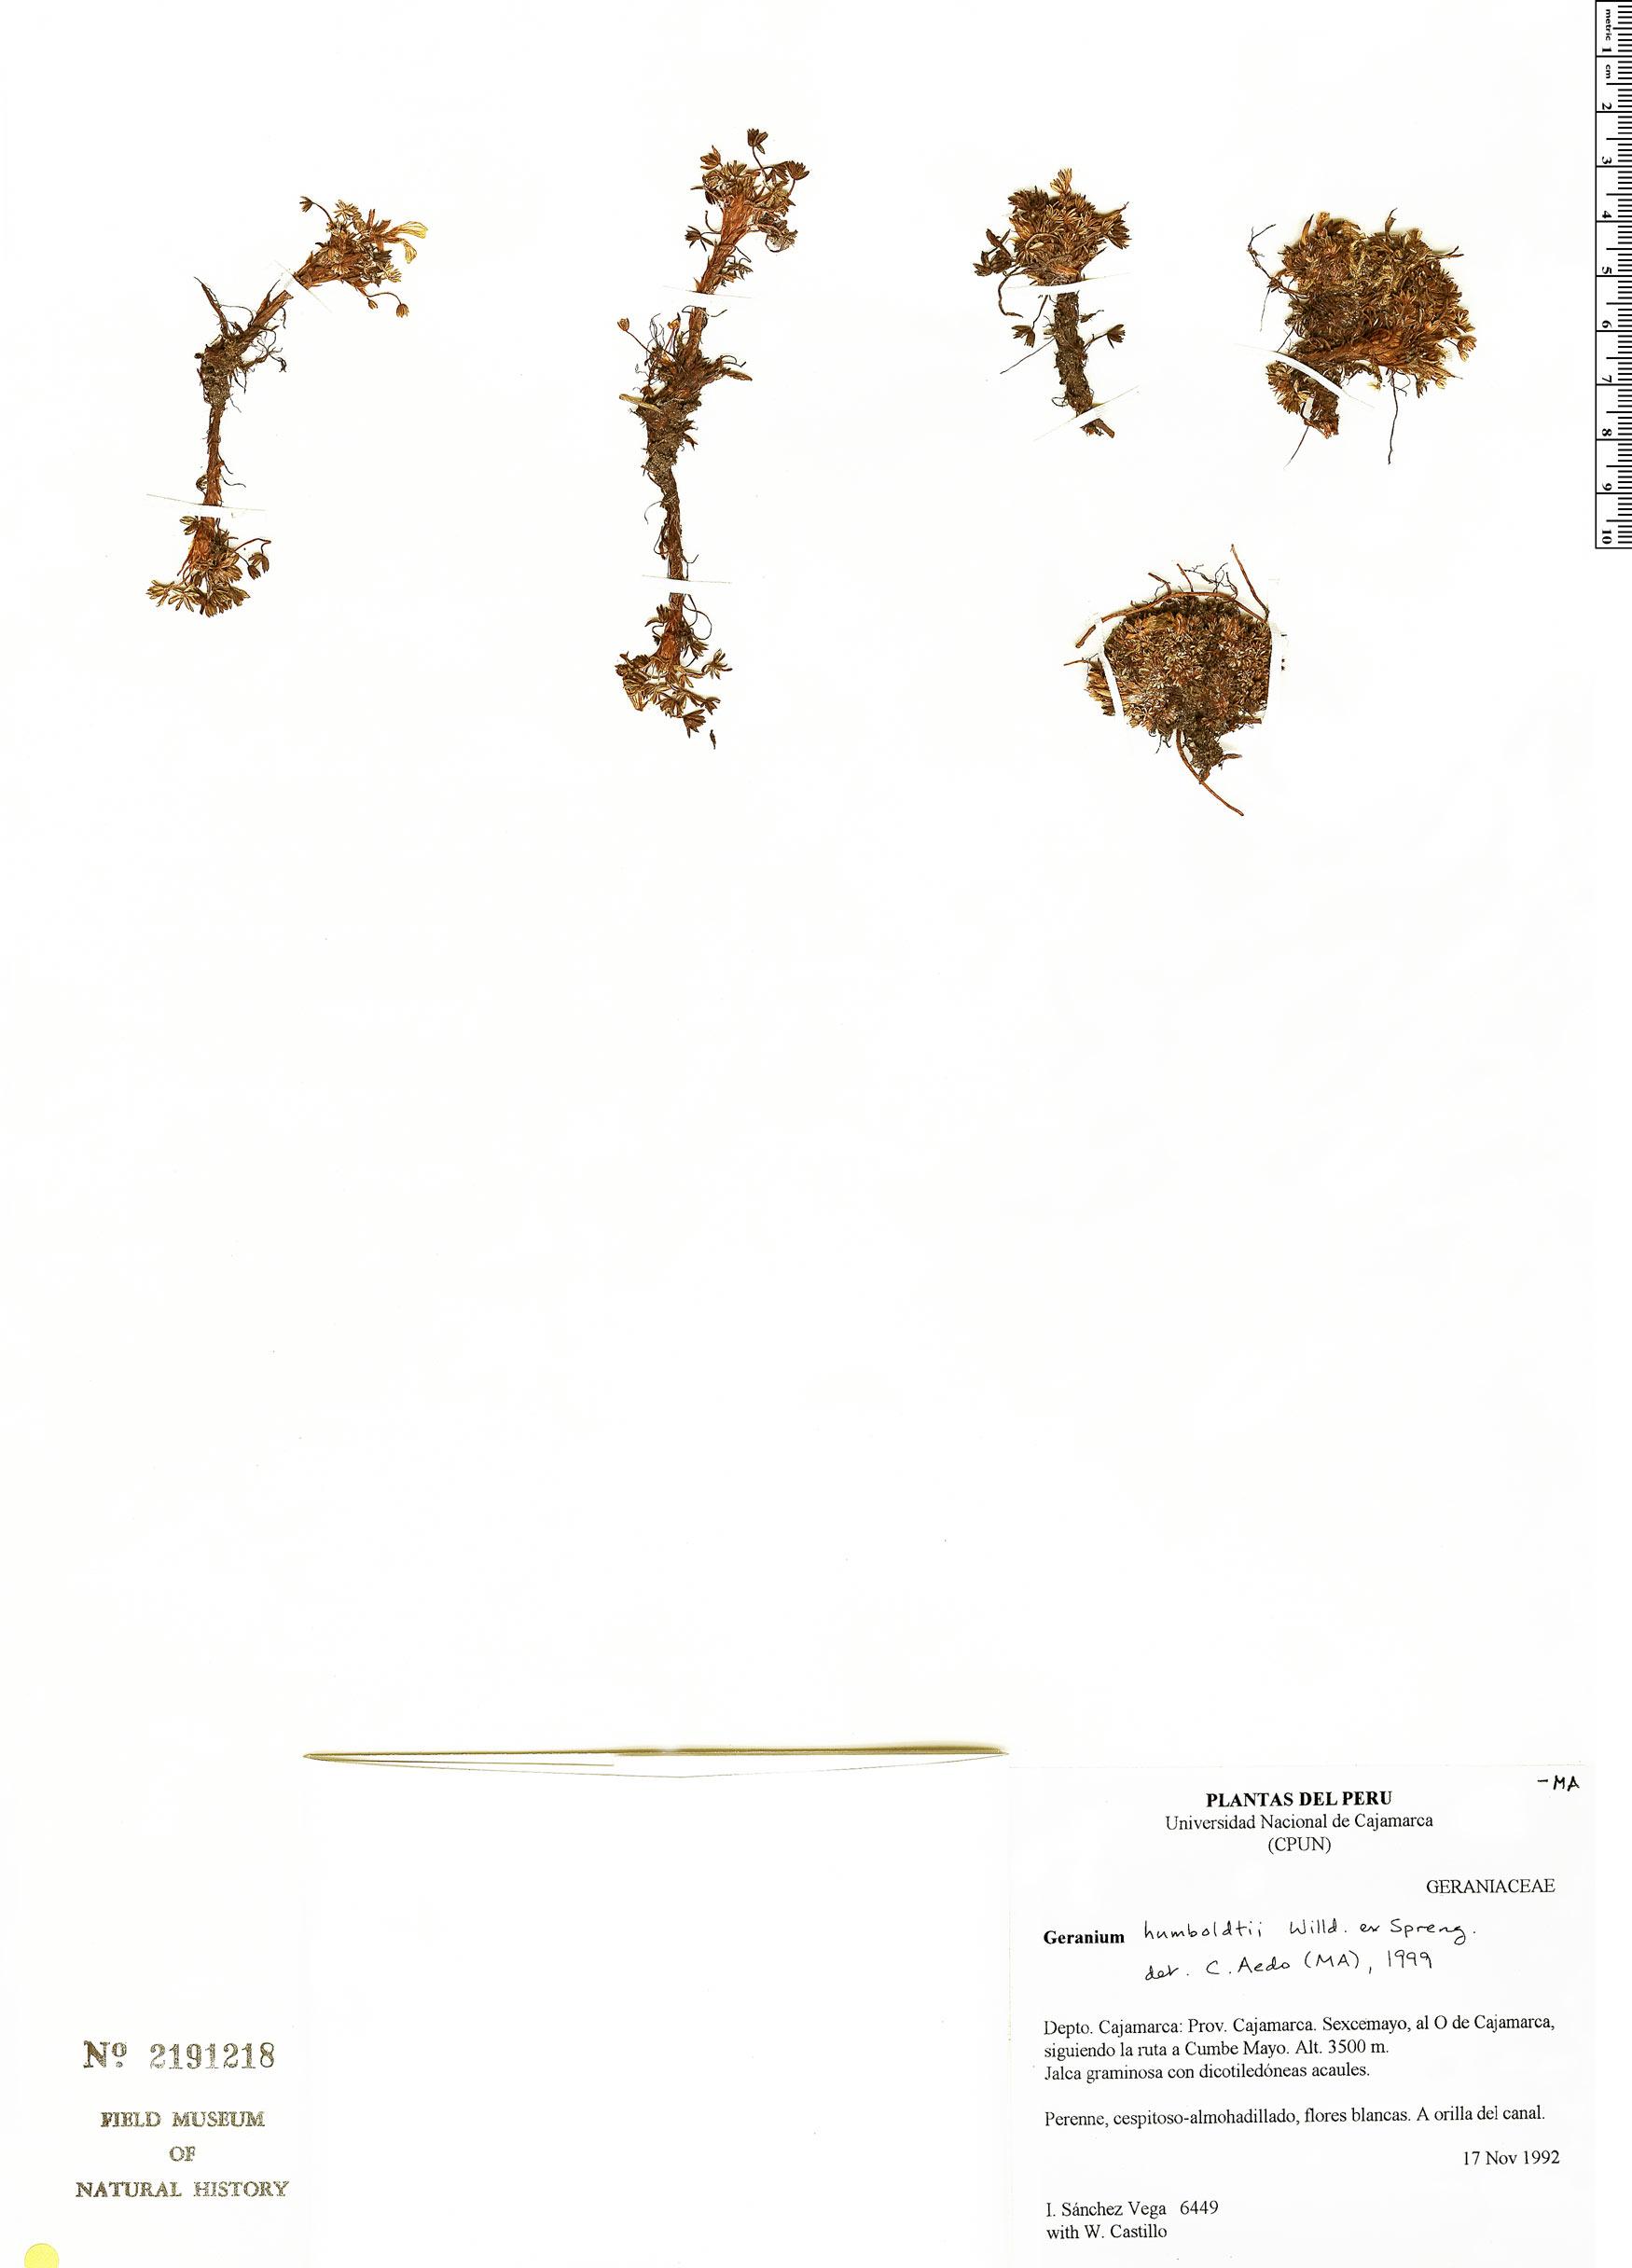 Geranium humboldtii image